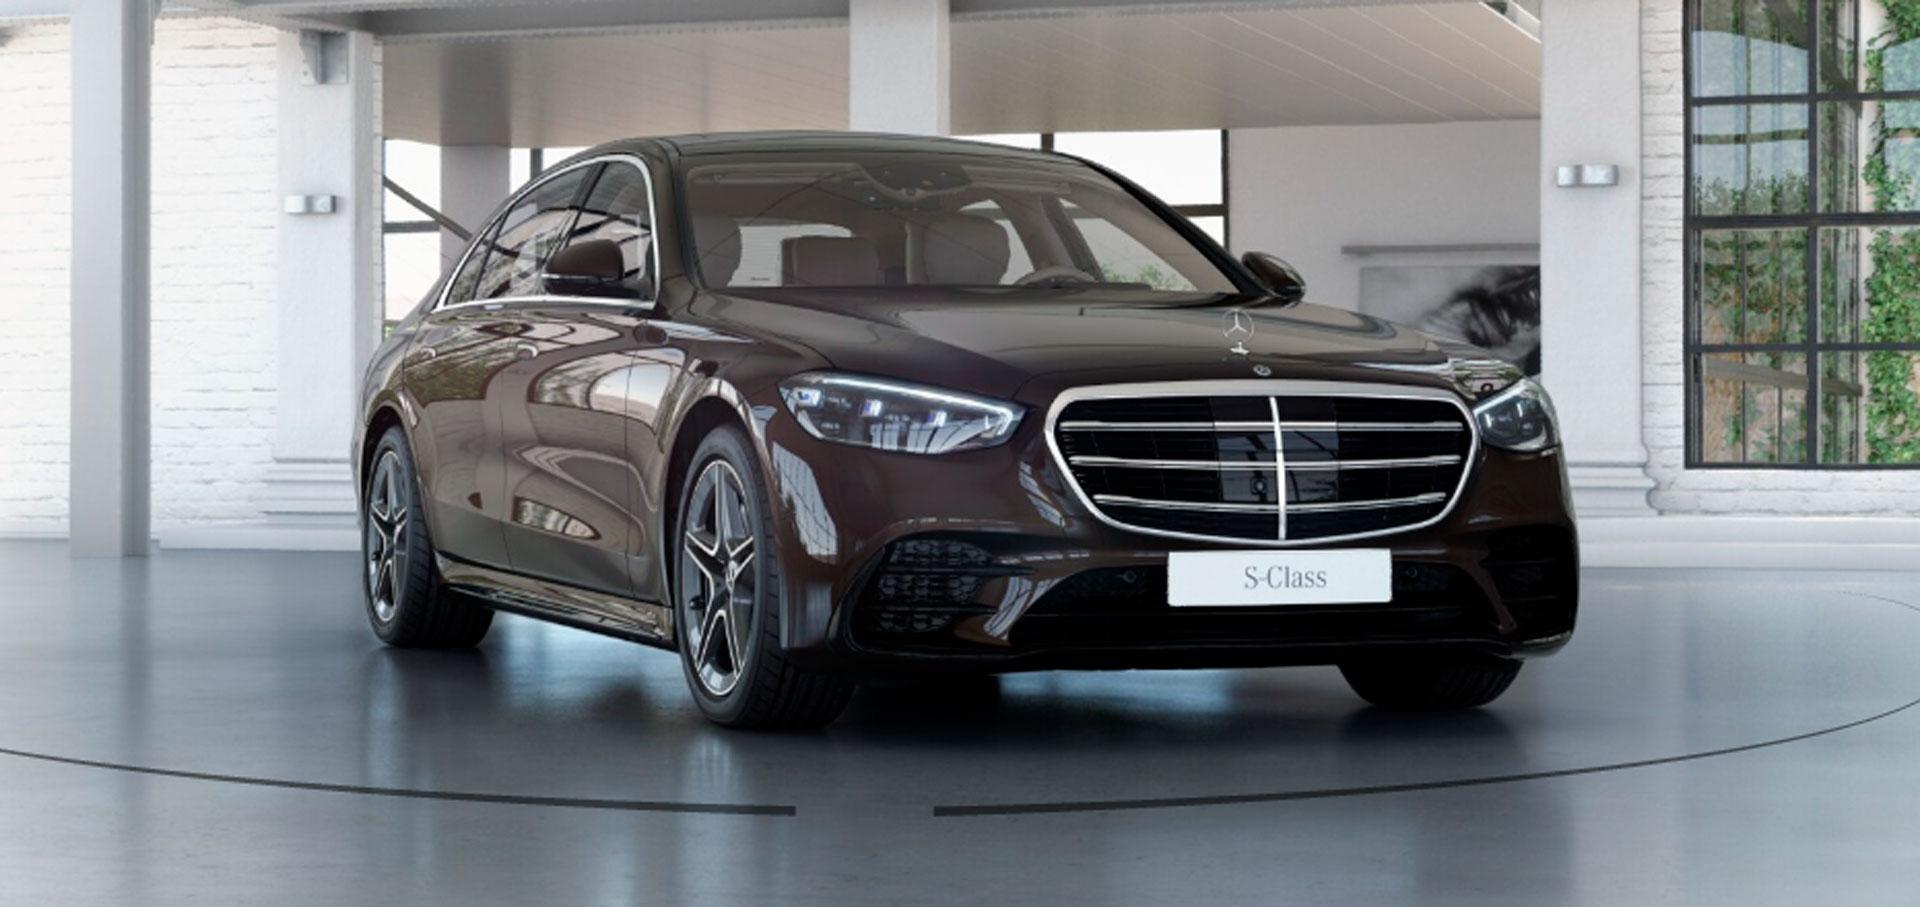 Mercedes-Benz S-Class Limousine 0152601214